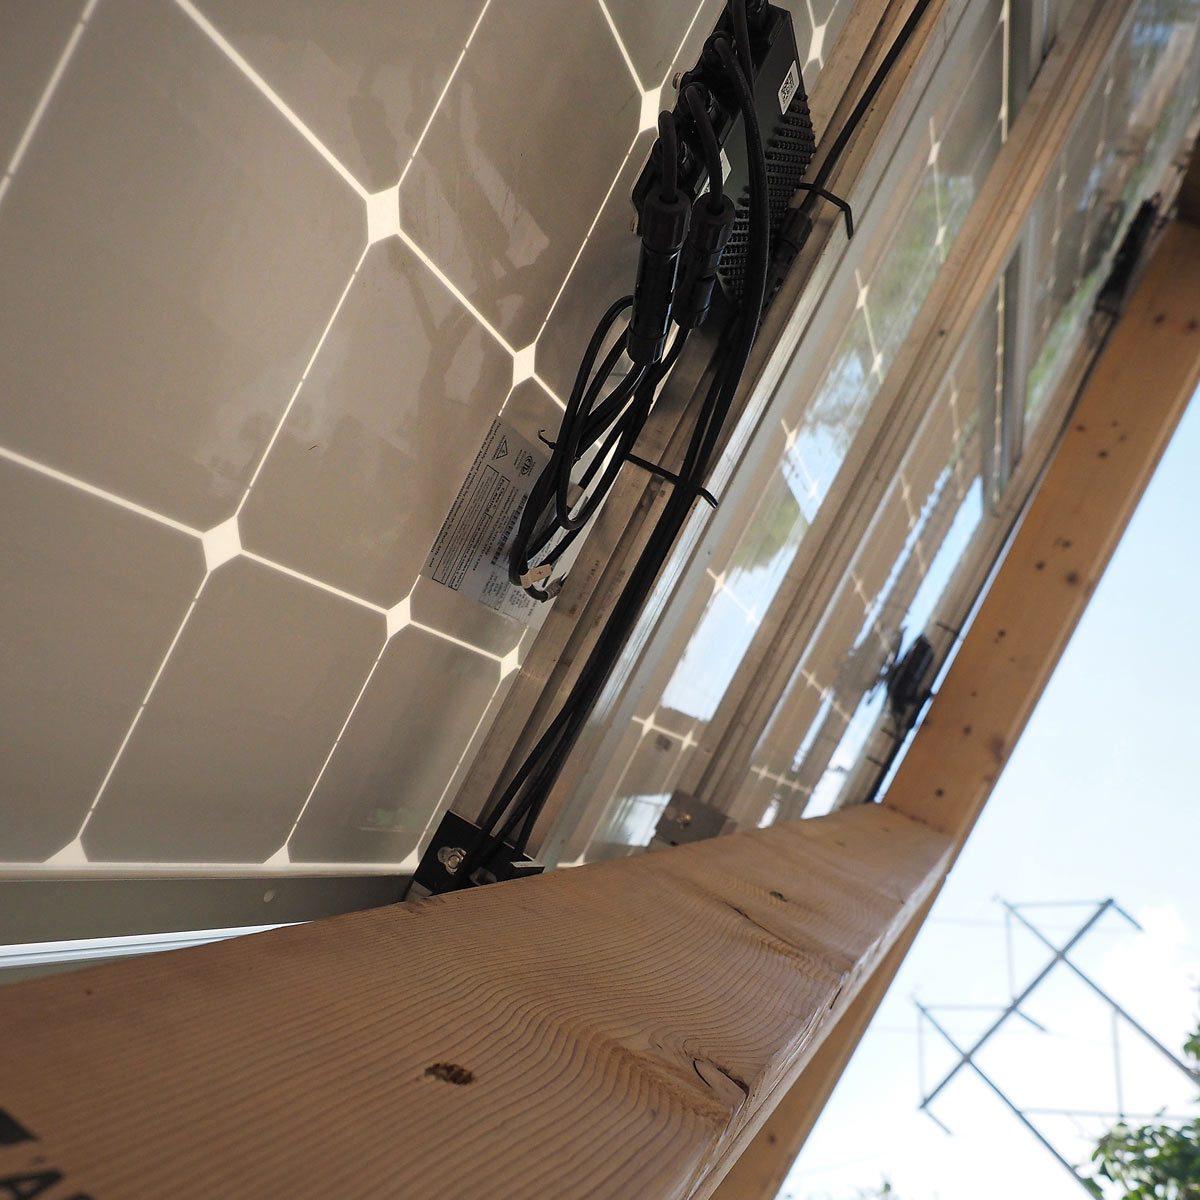 Solar saves money